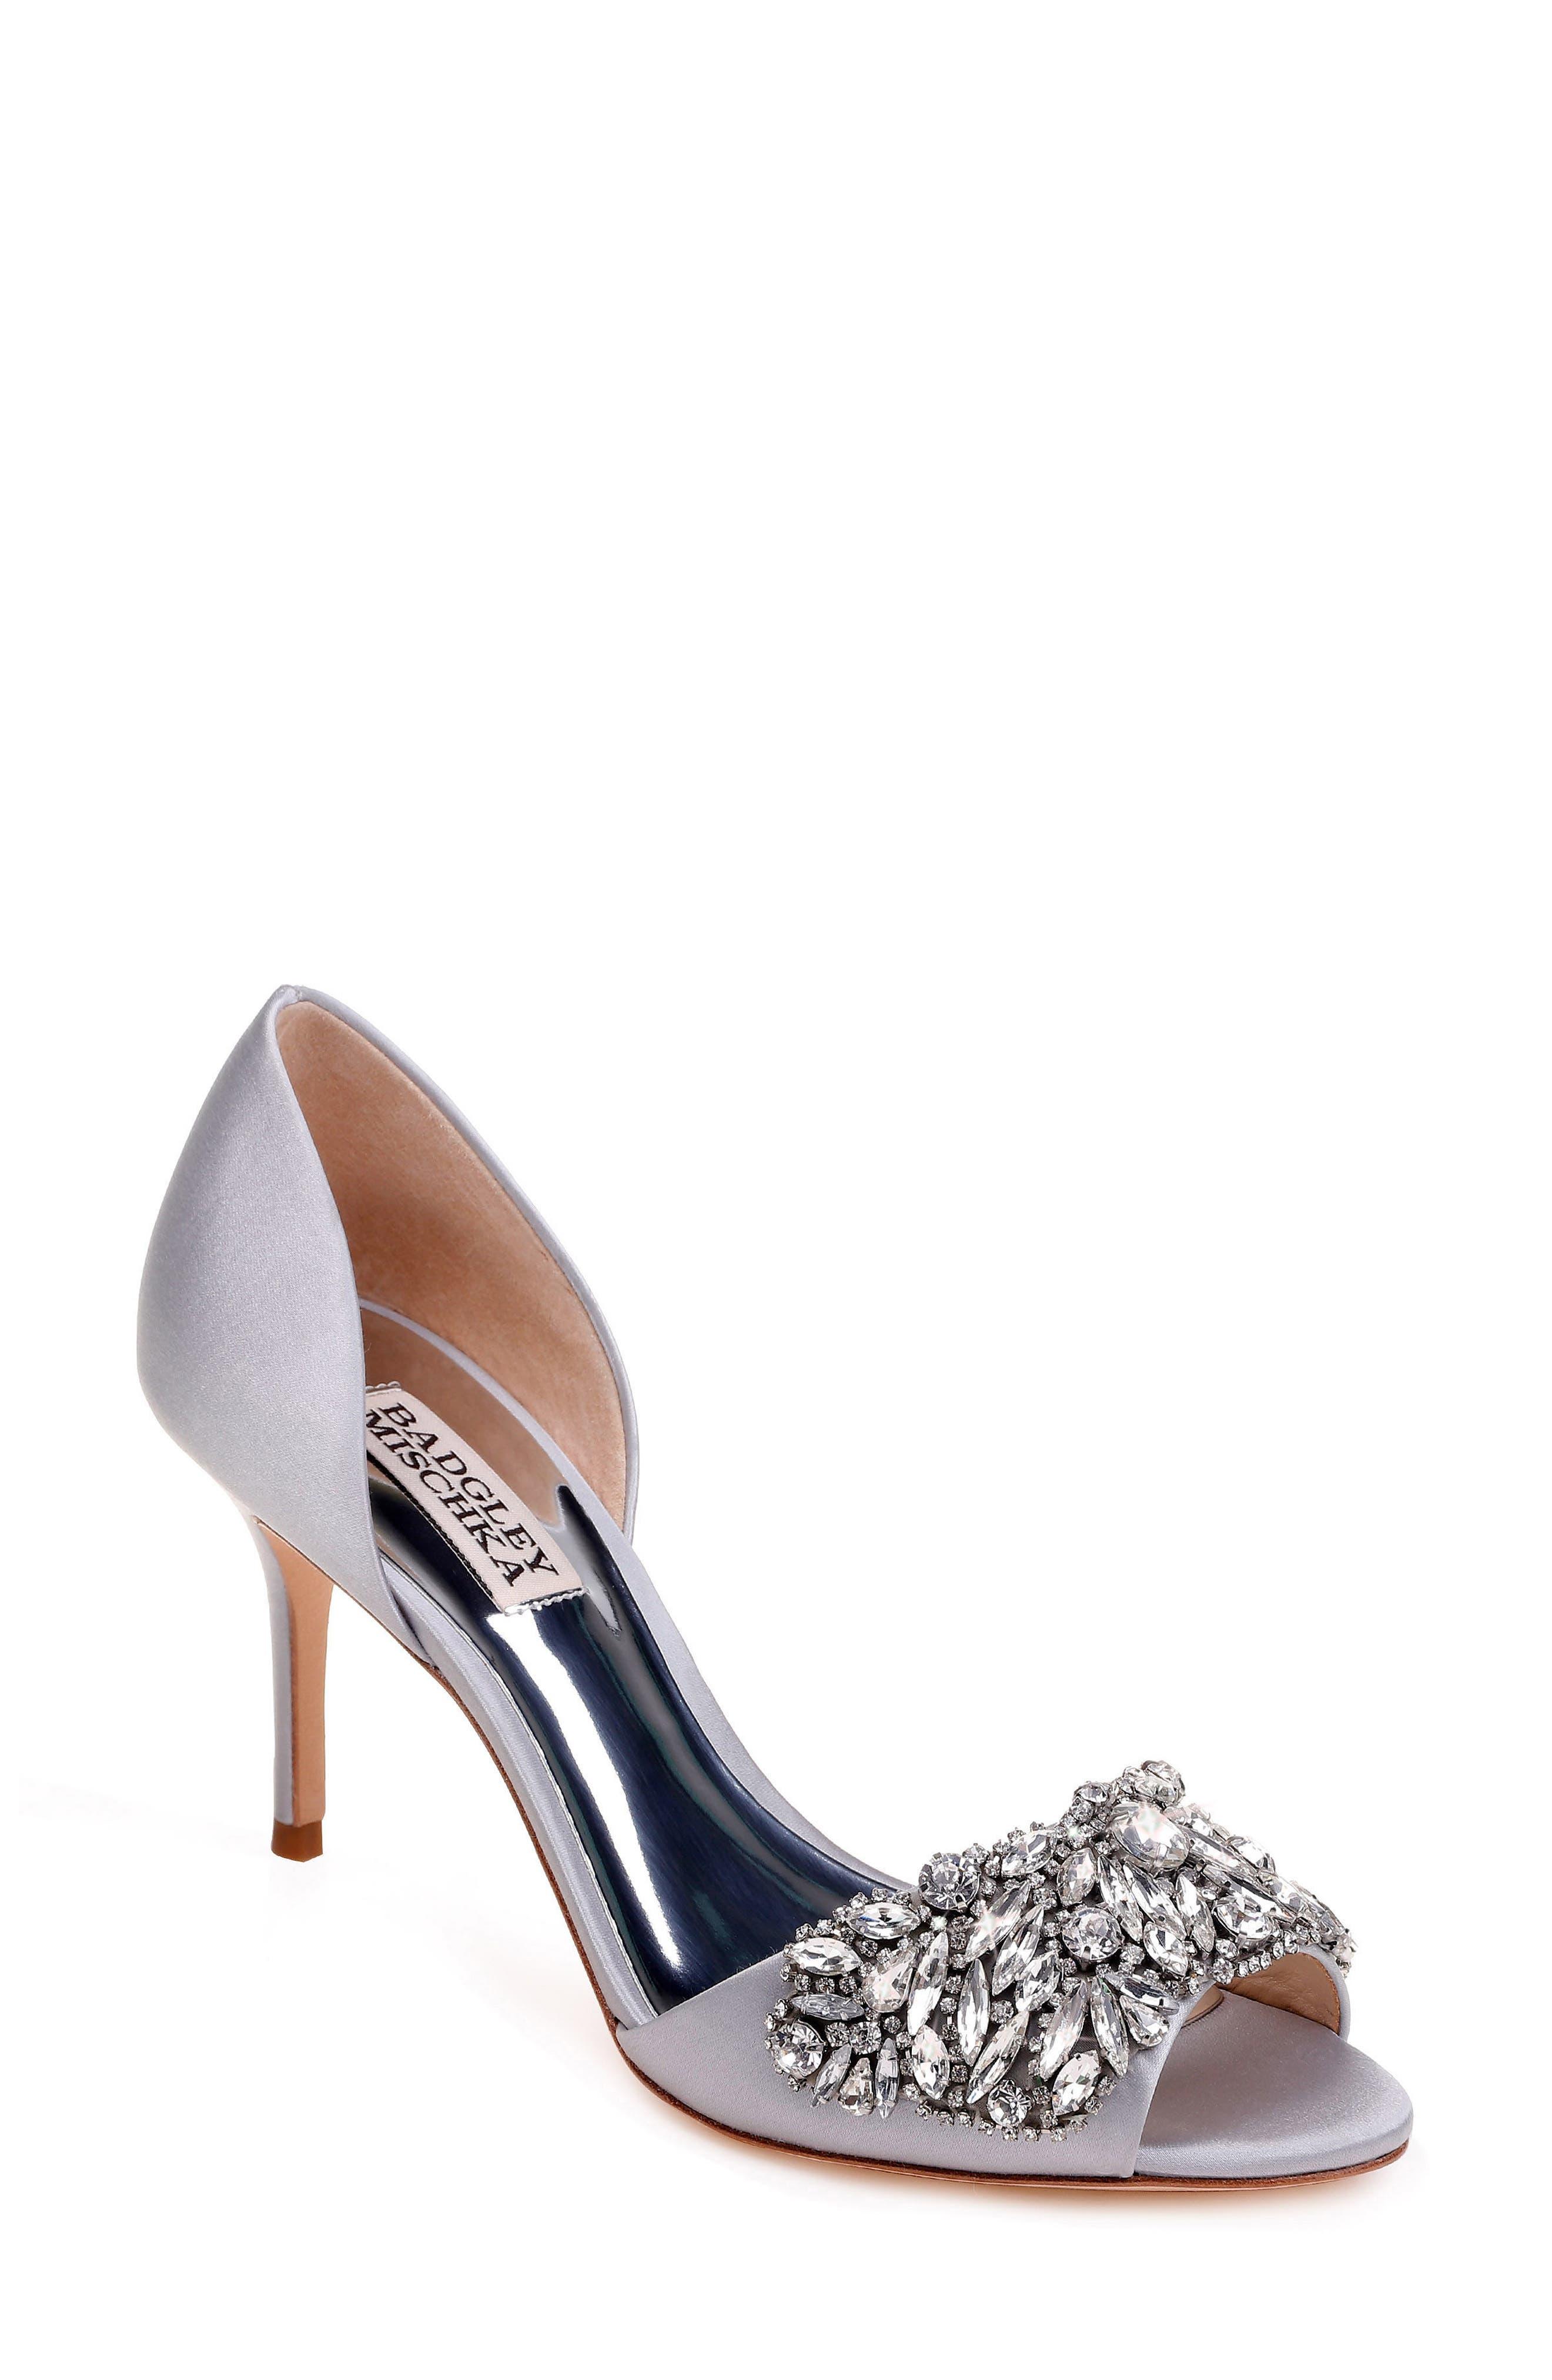 Hansen Crystal Embellished Sandal,                             Main thumbnail 1, color,                             Silver Satin